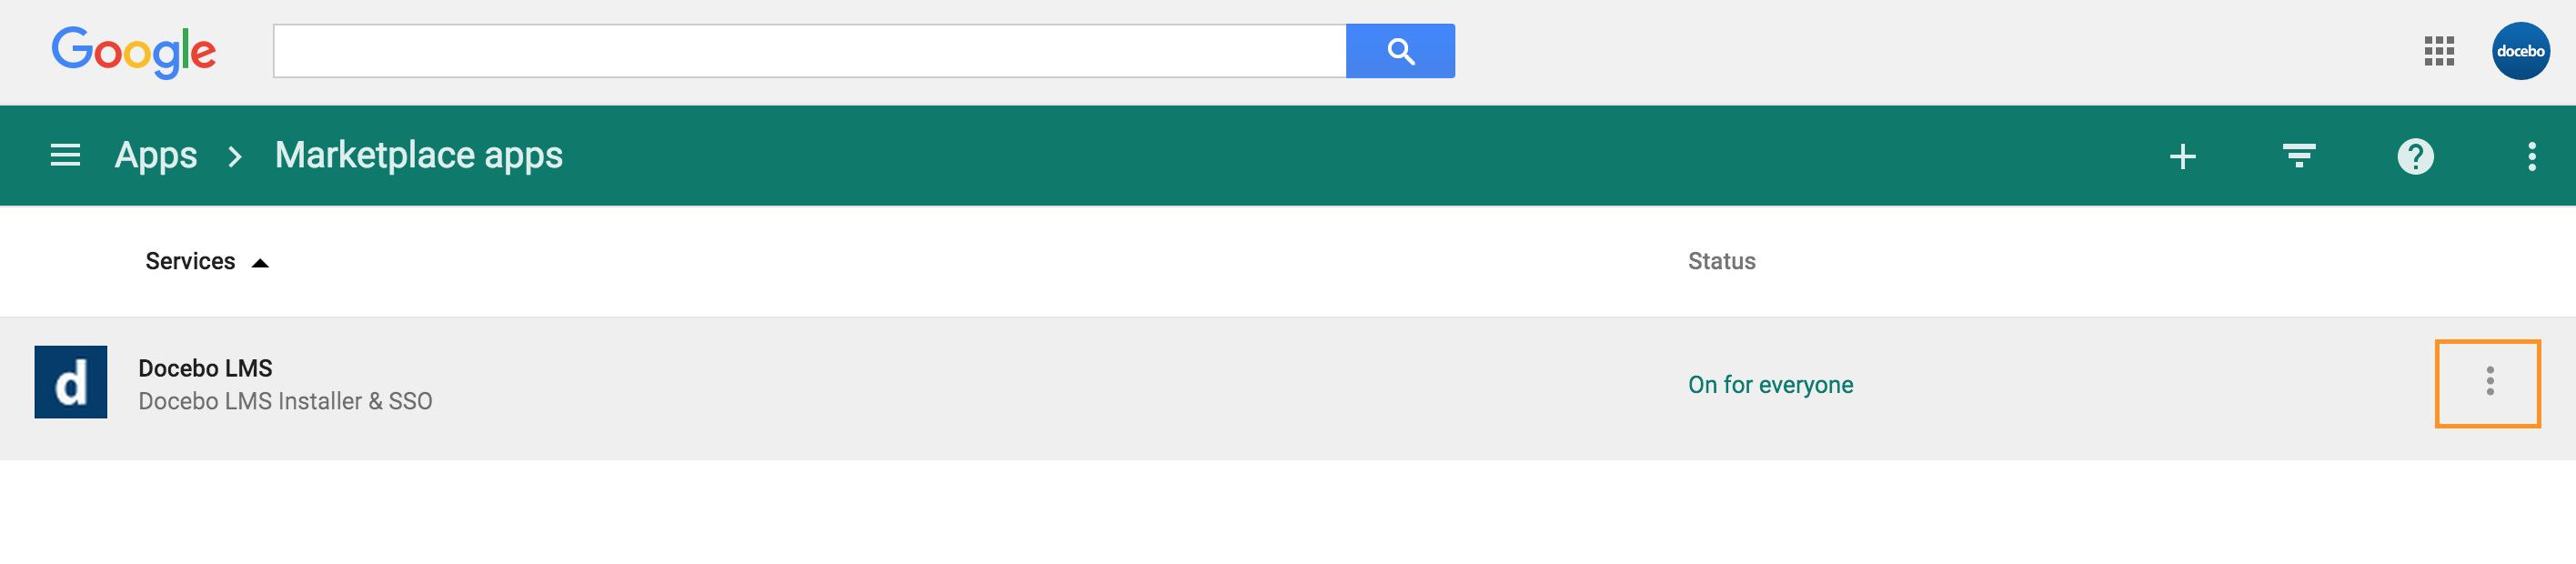 Google Marketplace Docebo LMS